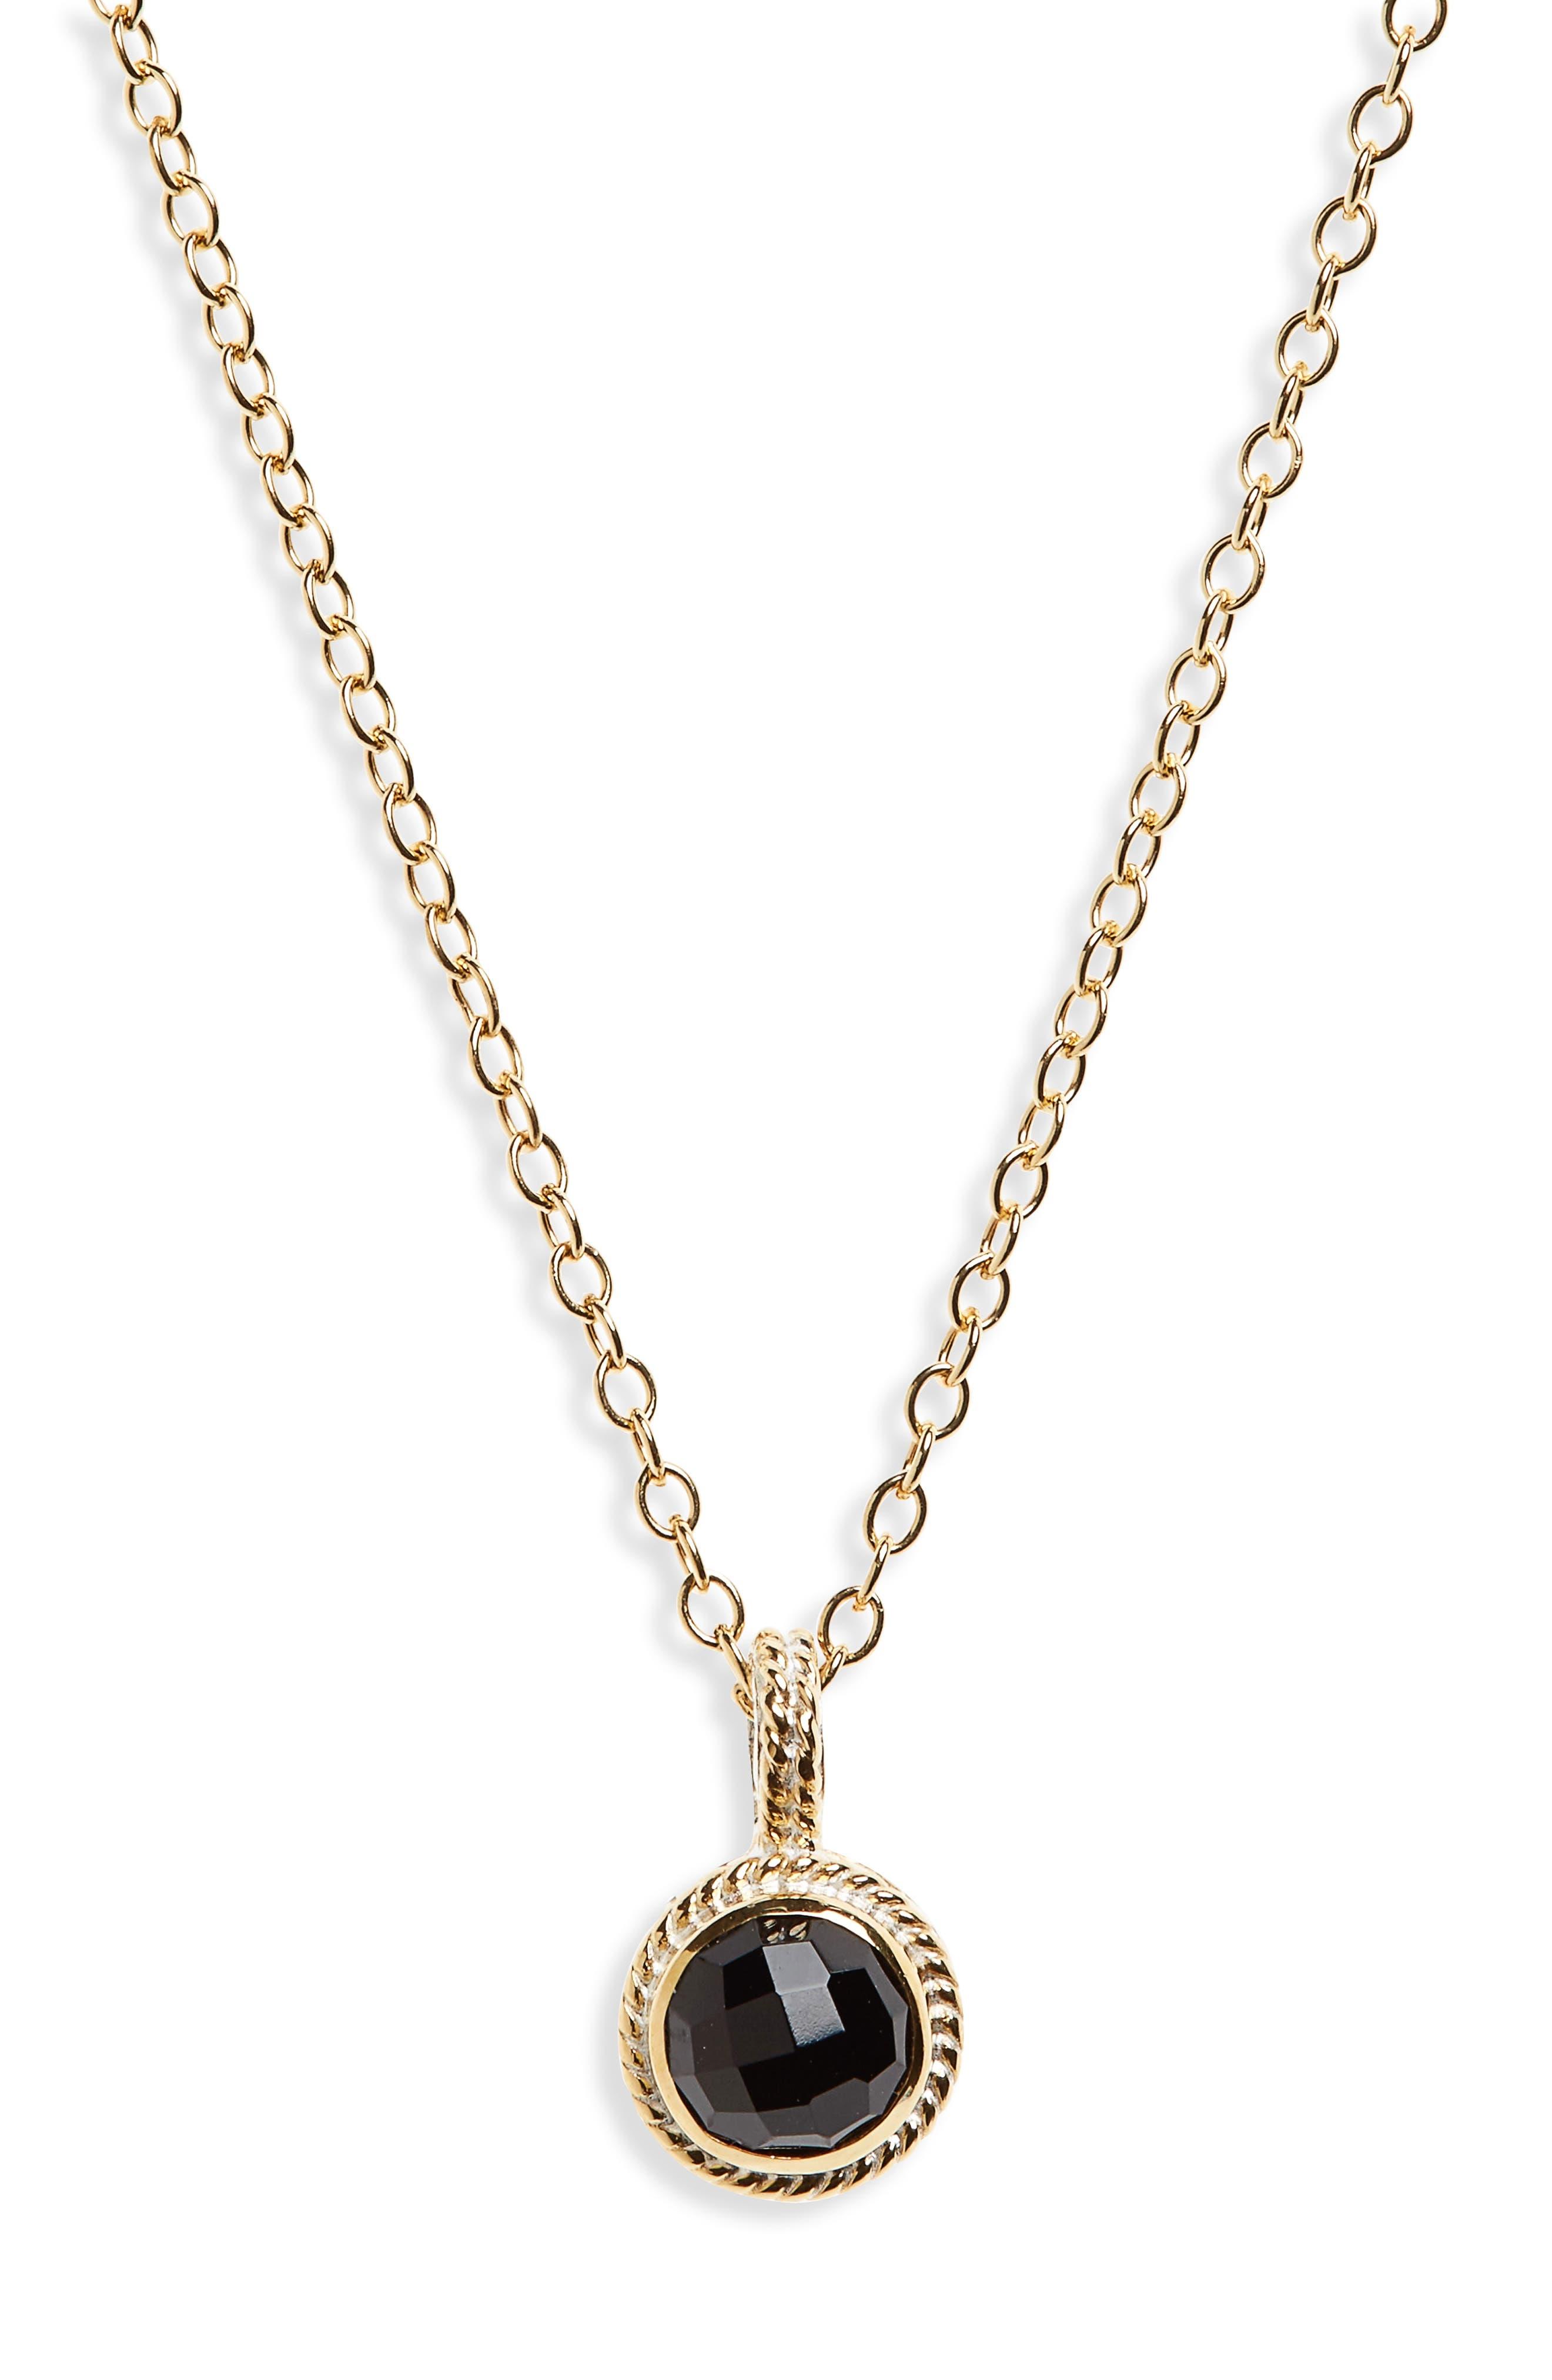 Semiprecious Stone Round Drop Pendant Necklace,                             Main thumbnail 1, color,                             Gold/ Black Onyx